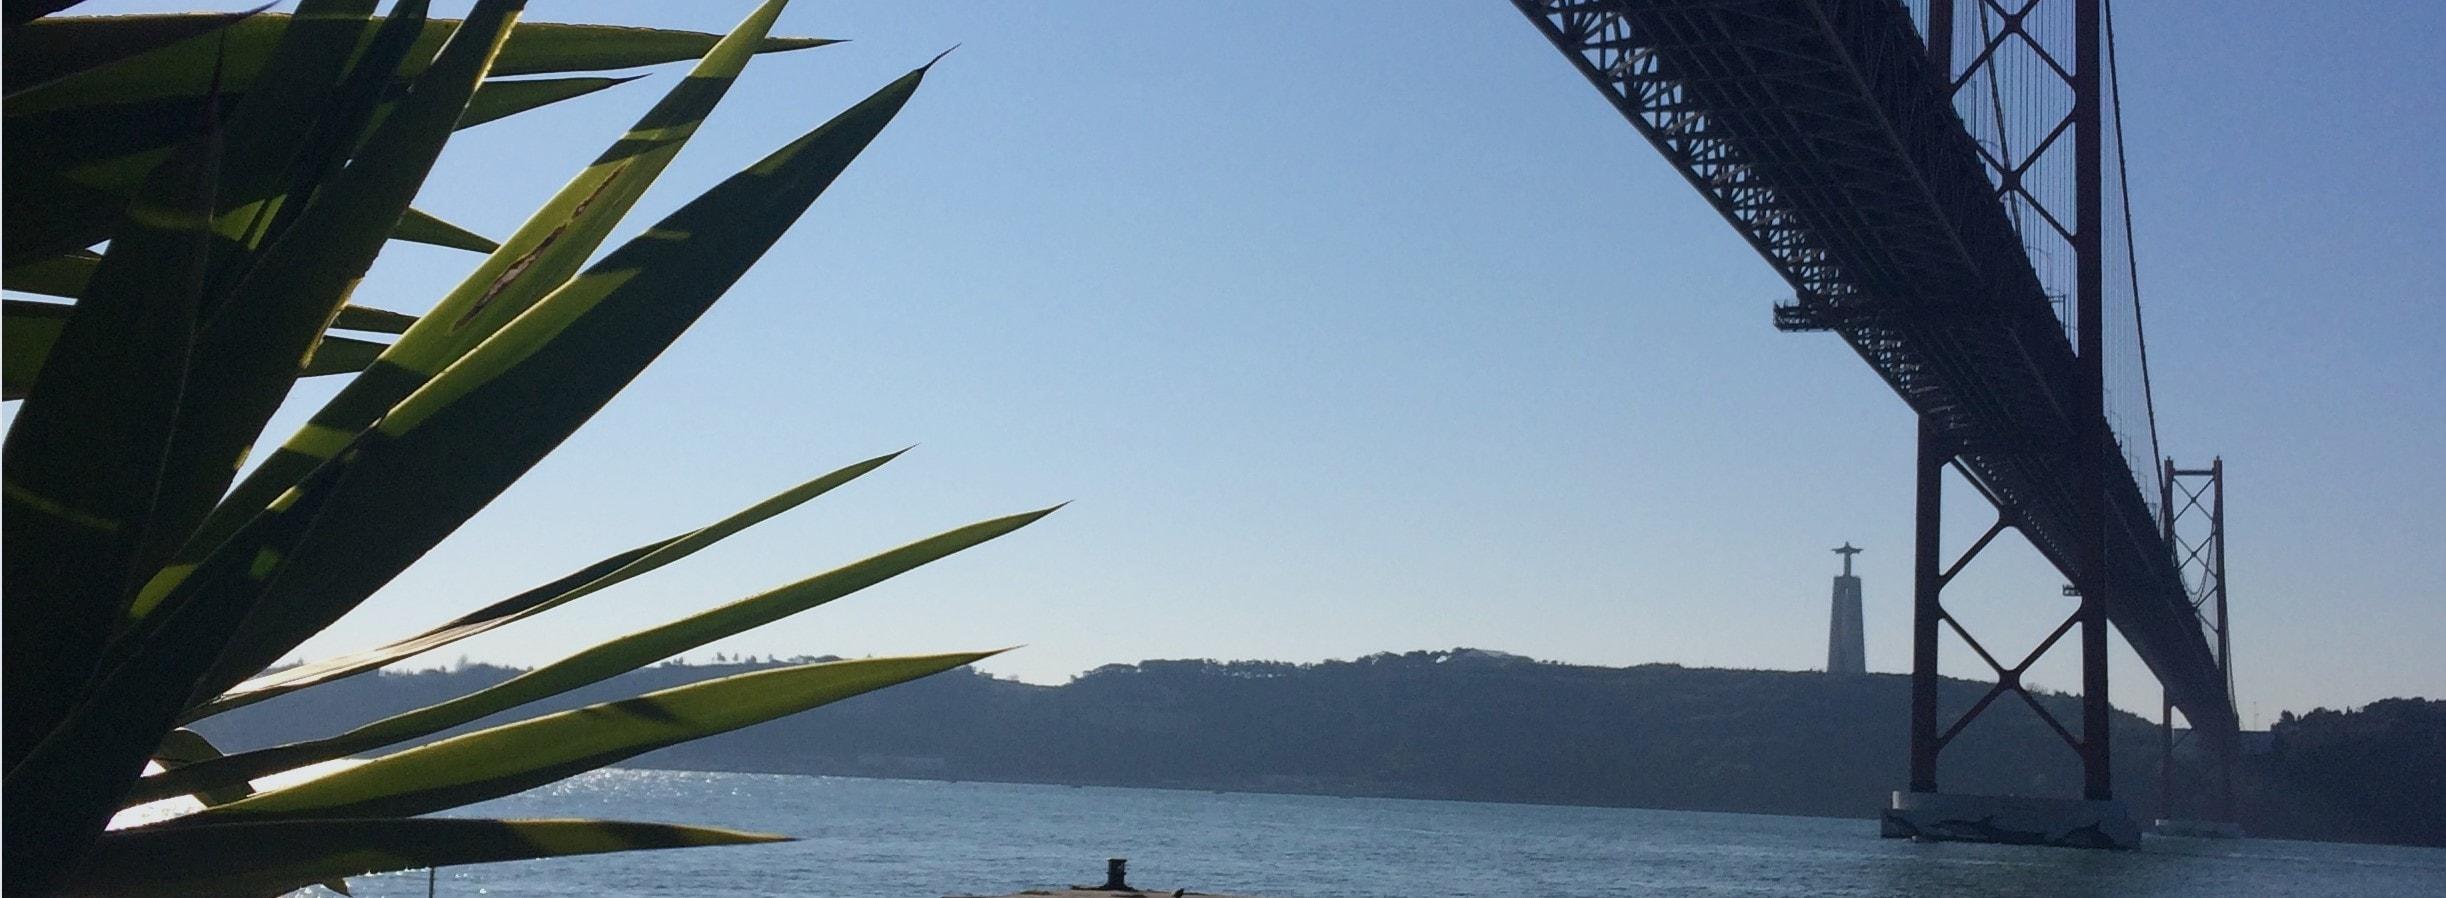 alcântara bridge by alcantara property guide by casafari portugal